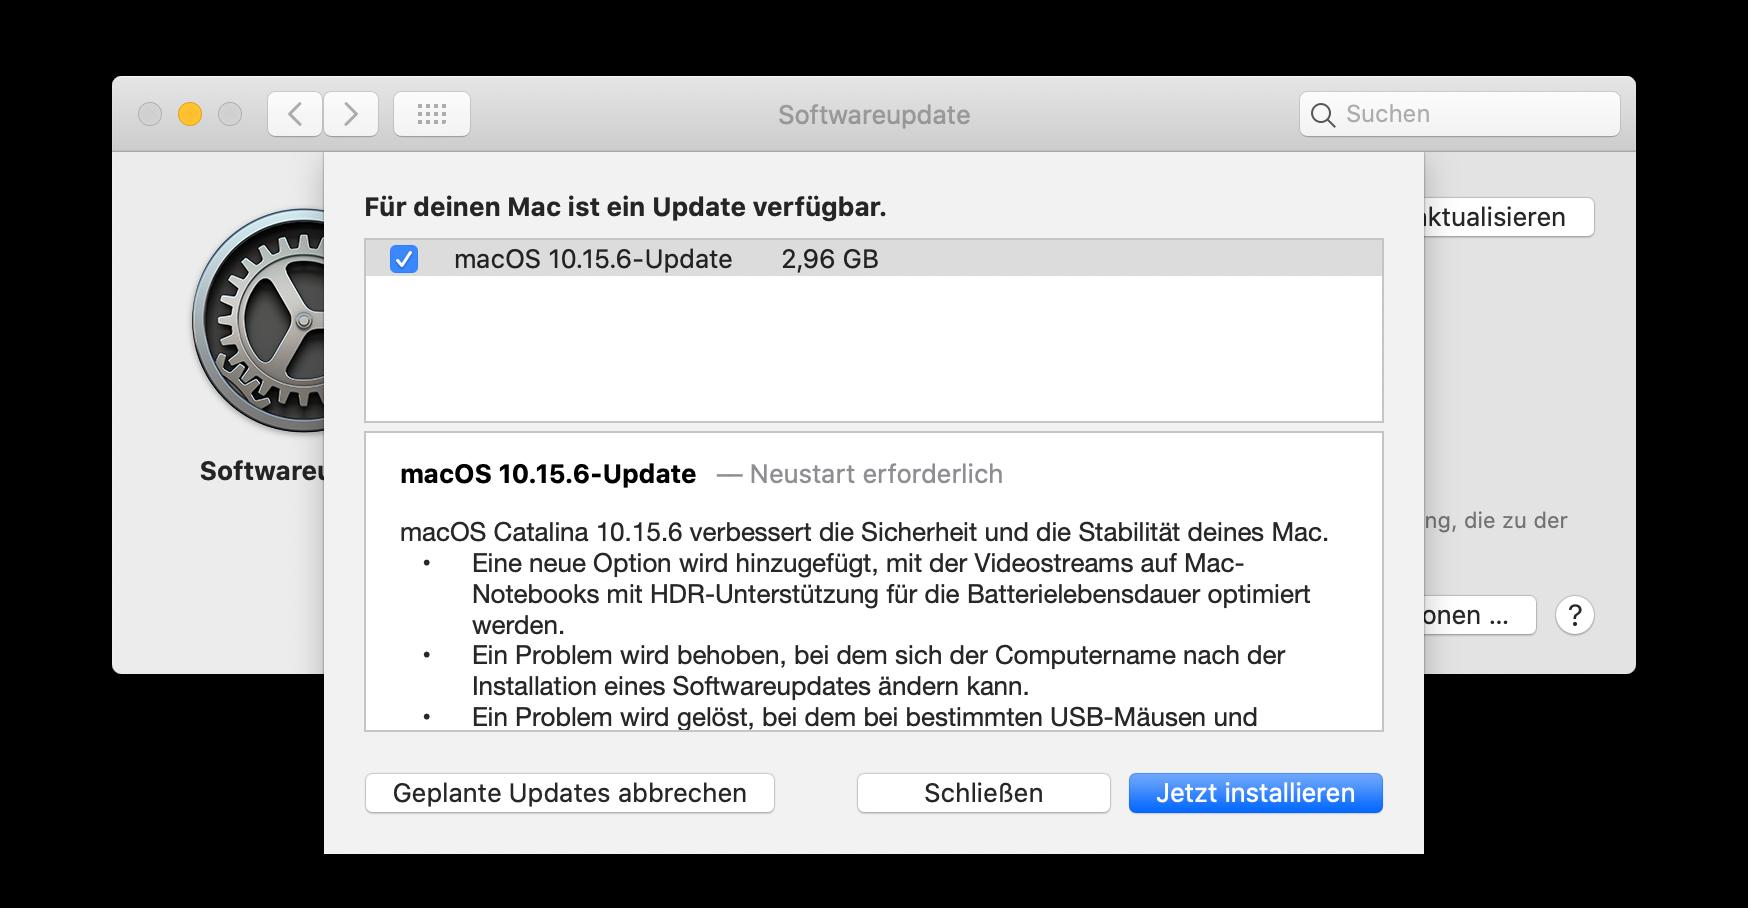 macOS 10.15.6 Update